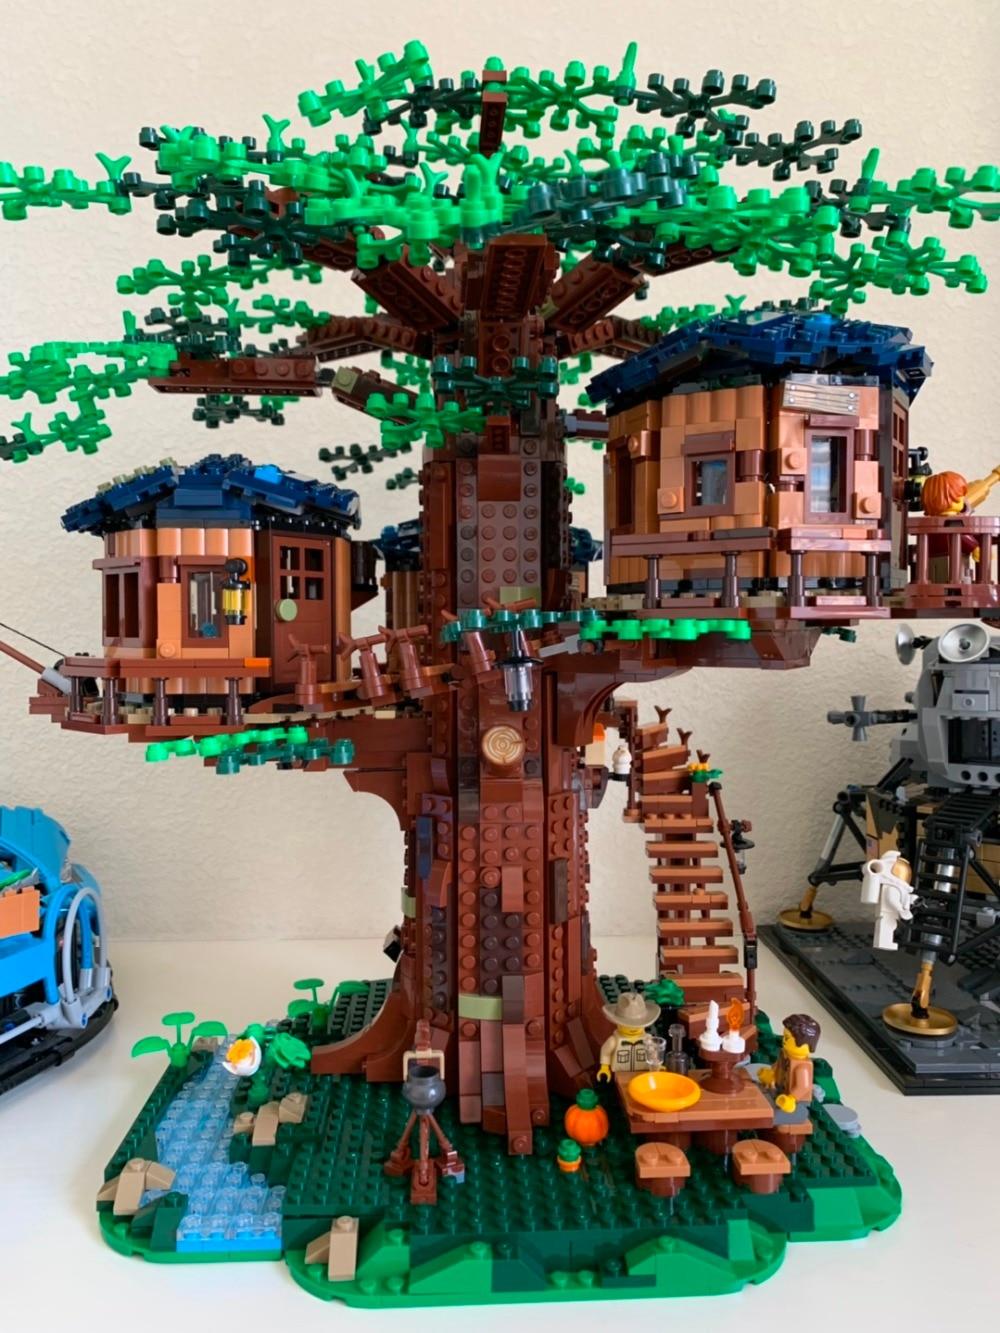 In stock SY6007 New 2019 Ideas Tree House Model Building Blocks Bricks Kids Toys Christmas Gifts 21318 1